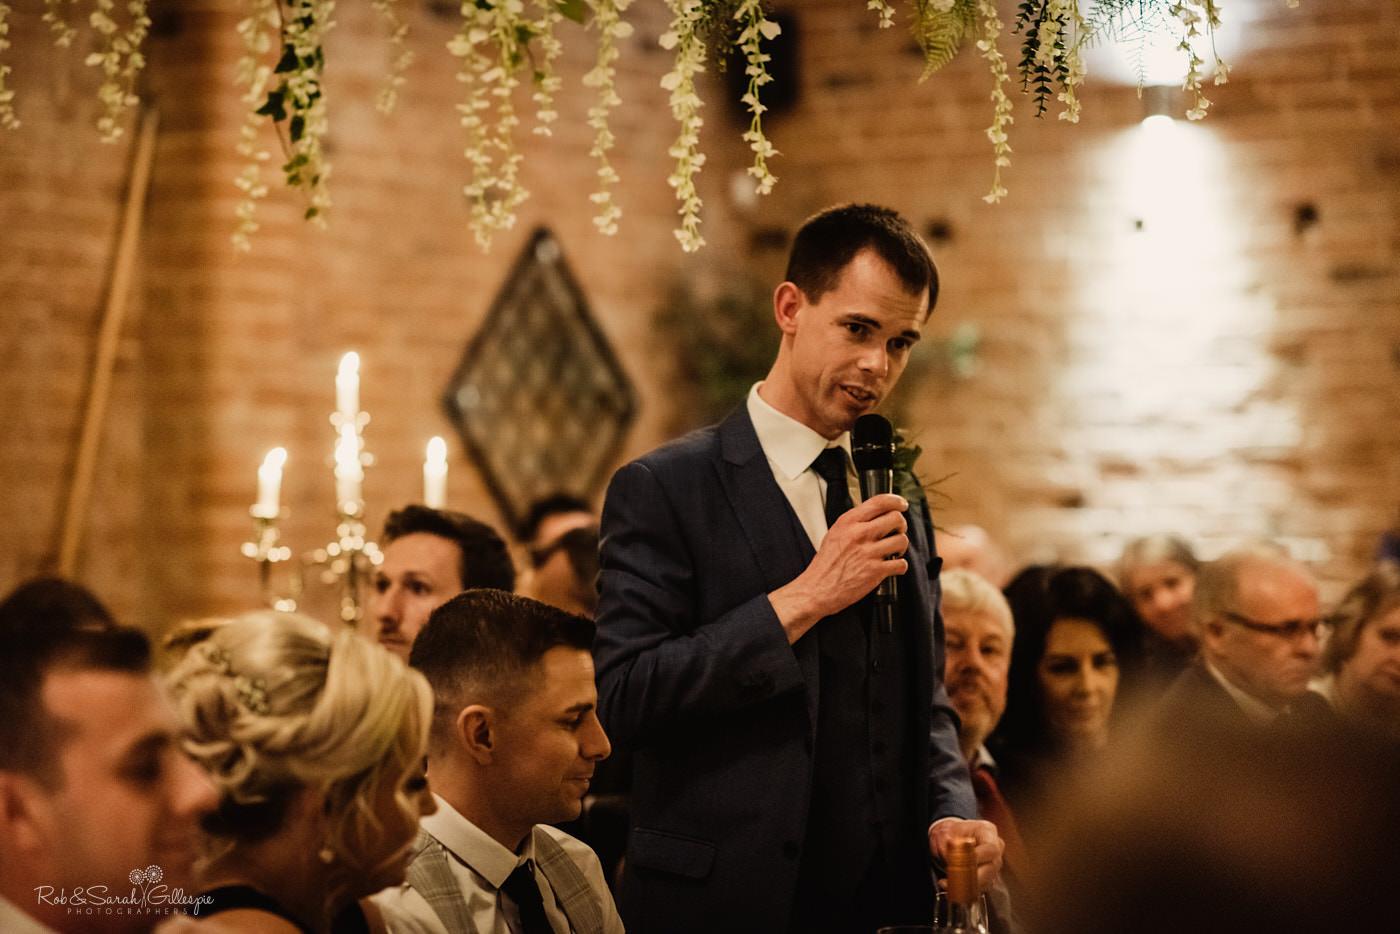 Speeches at Swallows Nest Barn wedding